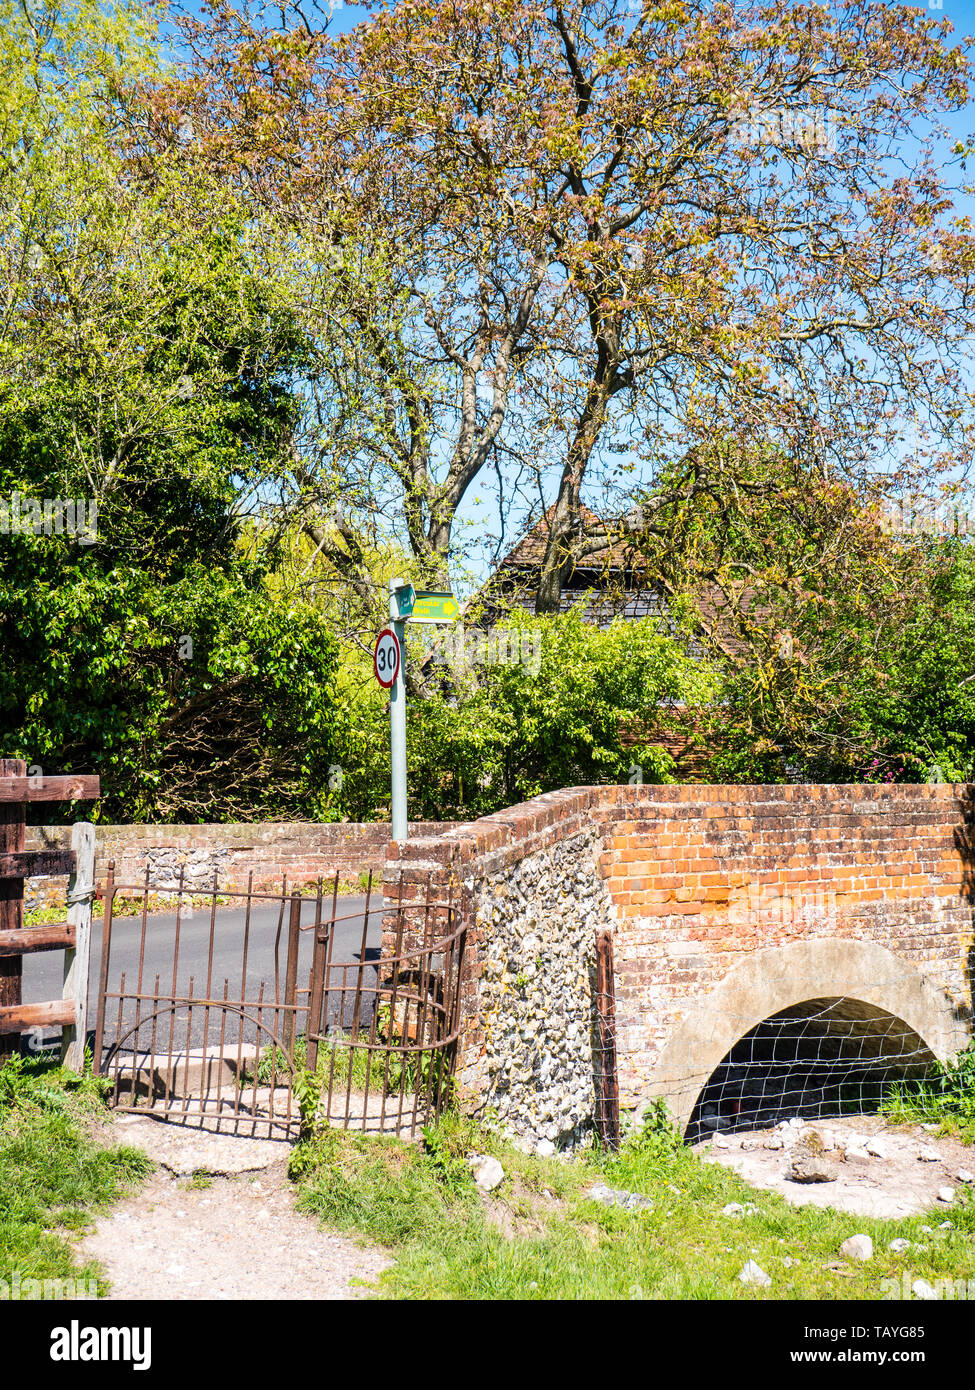 Kissin gate and Bridge, on way into Hambledon Village, Buckinghamshire, England, UK, GB. - Stock Image